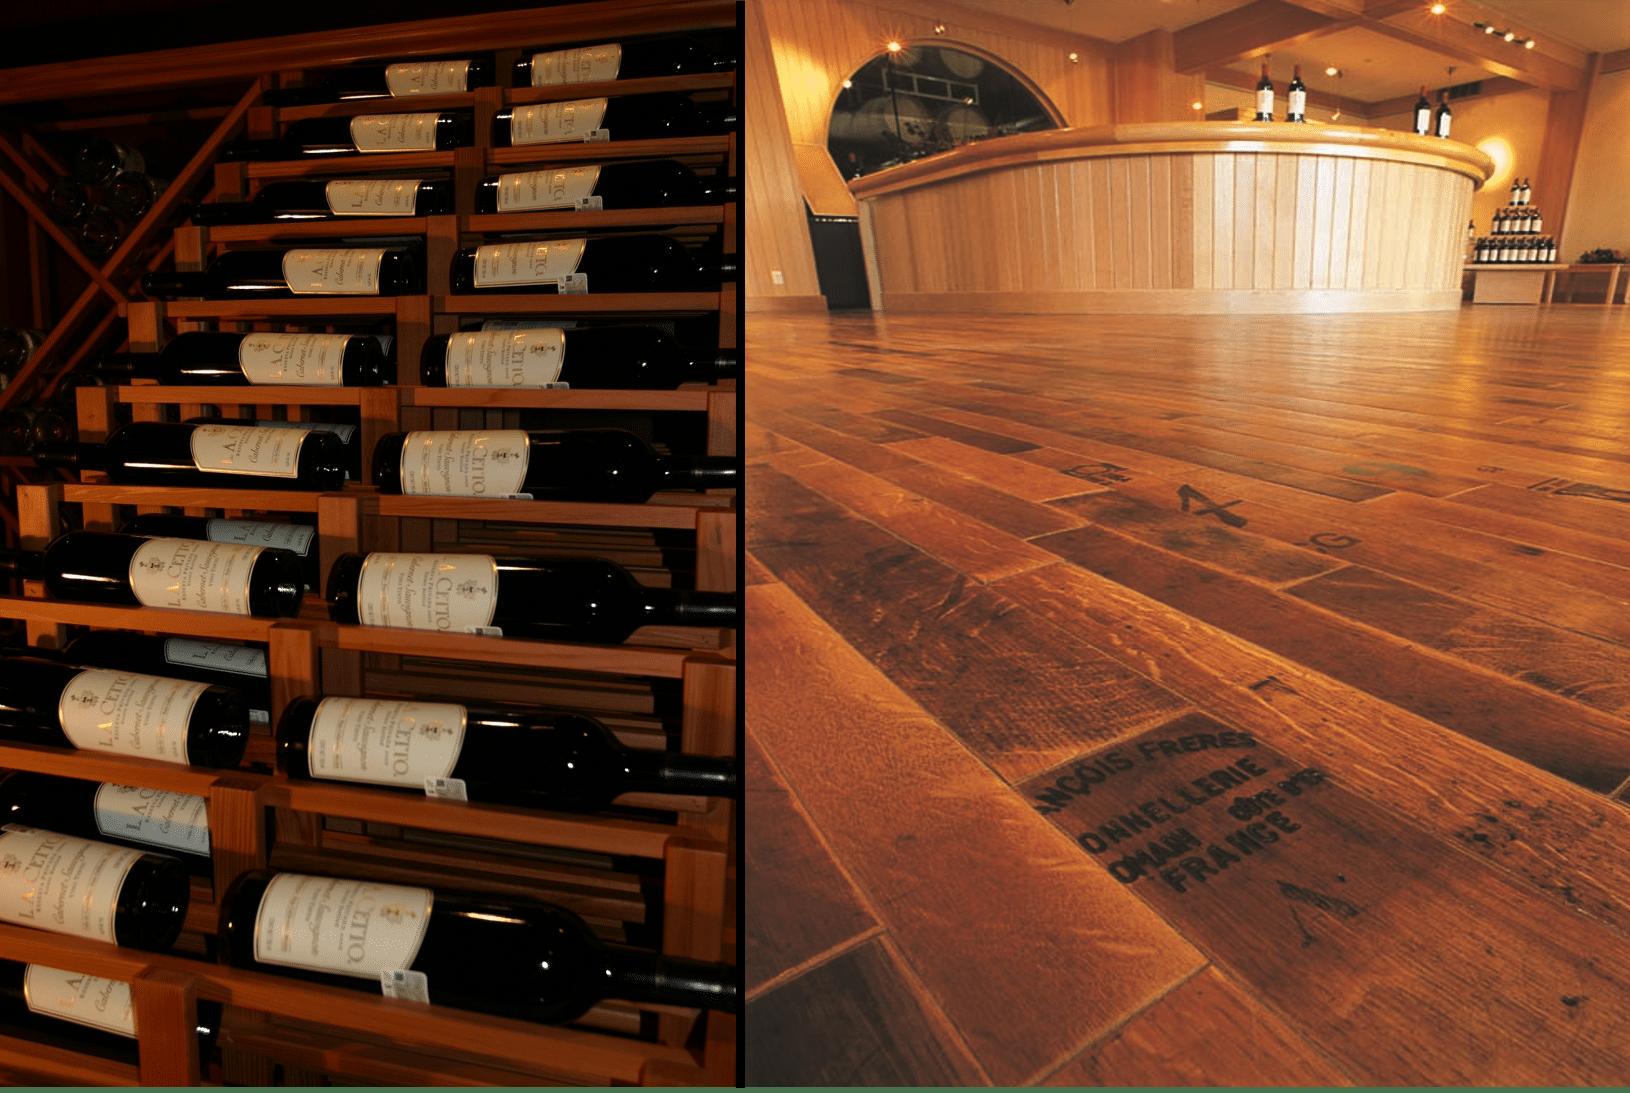 02 miami beach south florida hospitality wine cellars wine barrel flooring and waterfall display barrel wine cellar designs